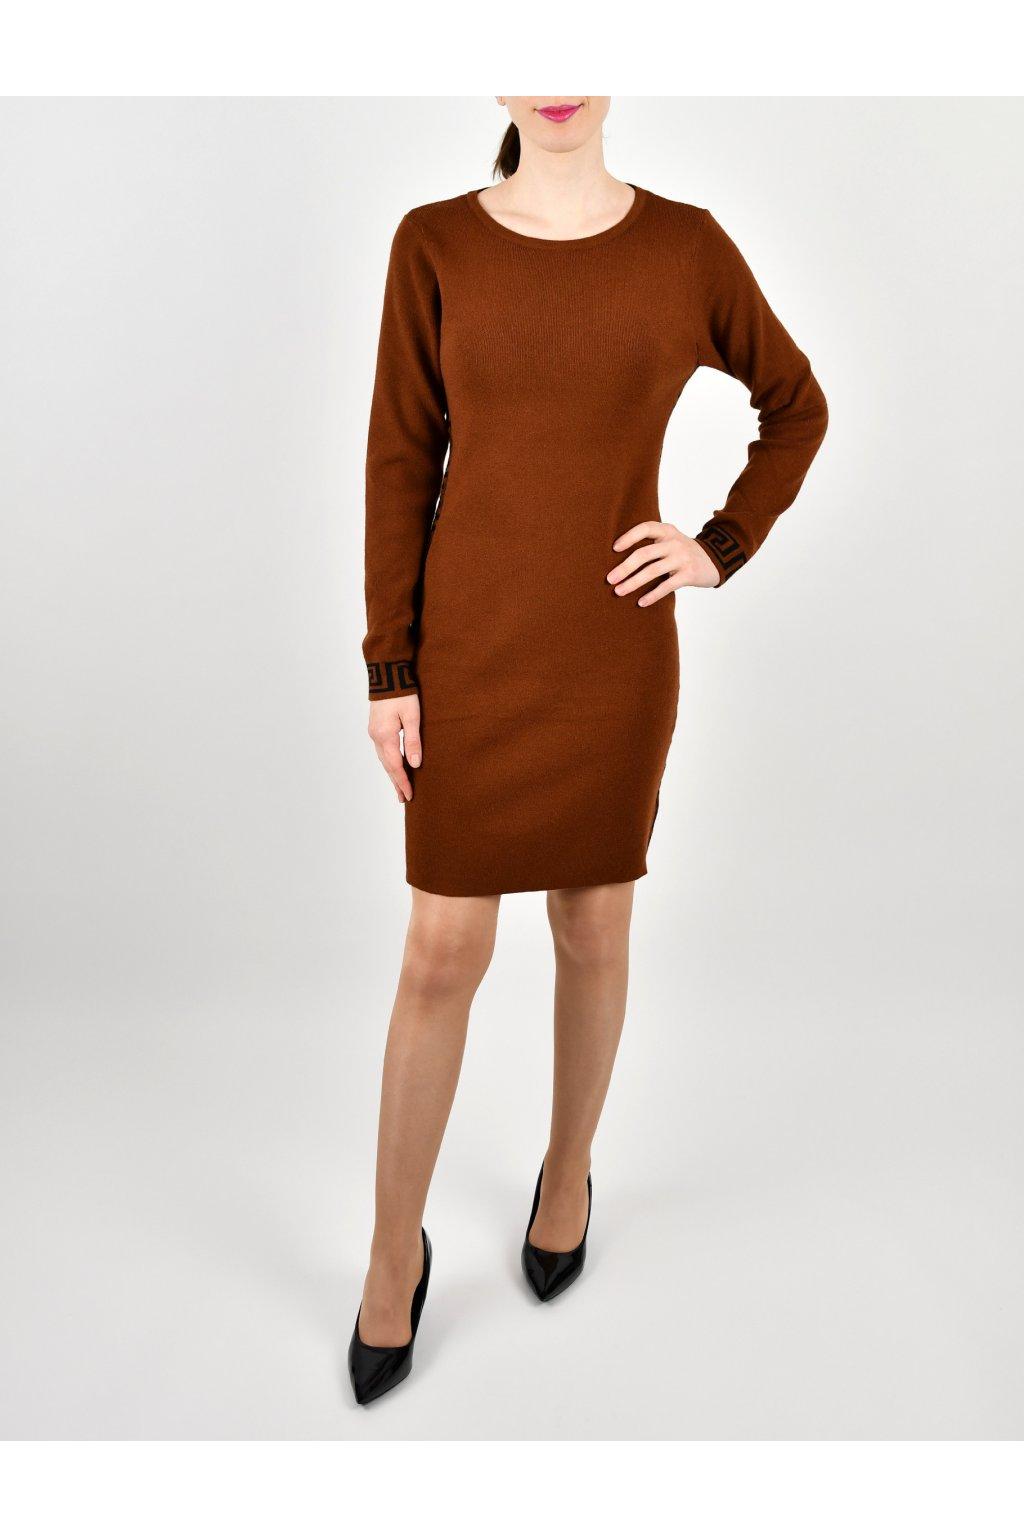 Šaty úpletové - VERS-2BL